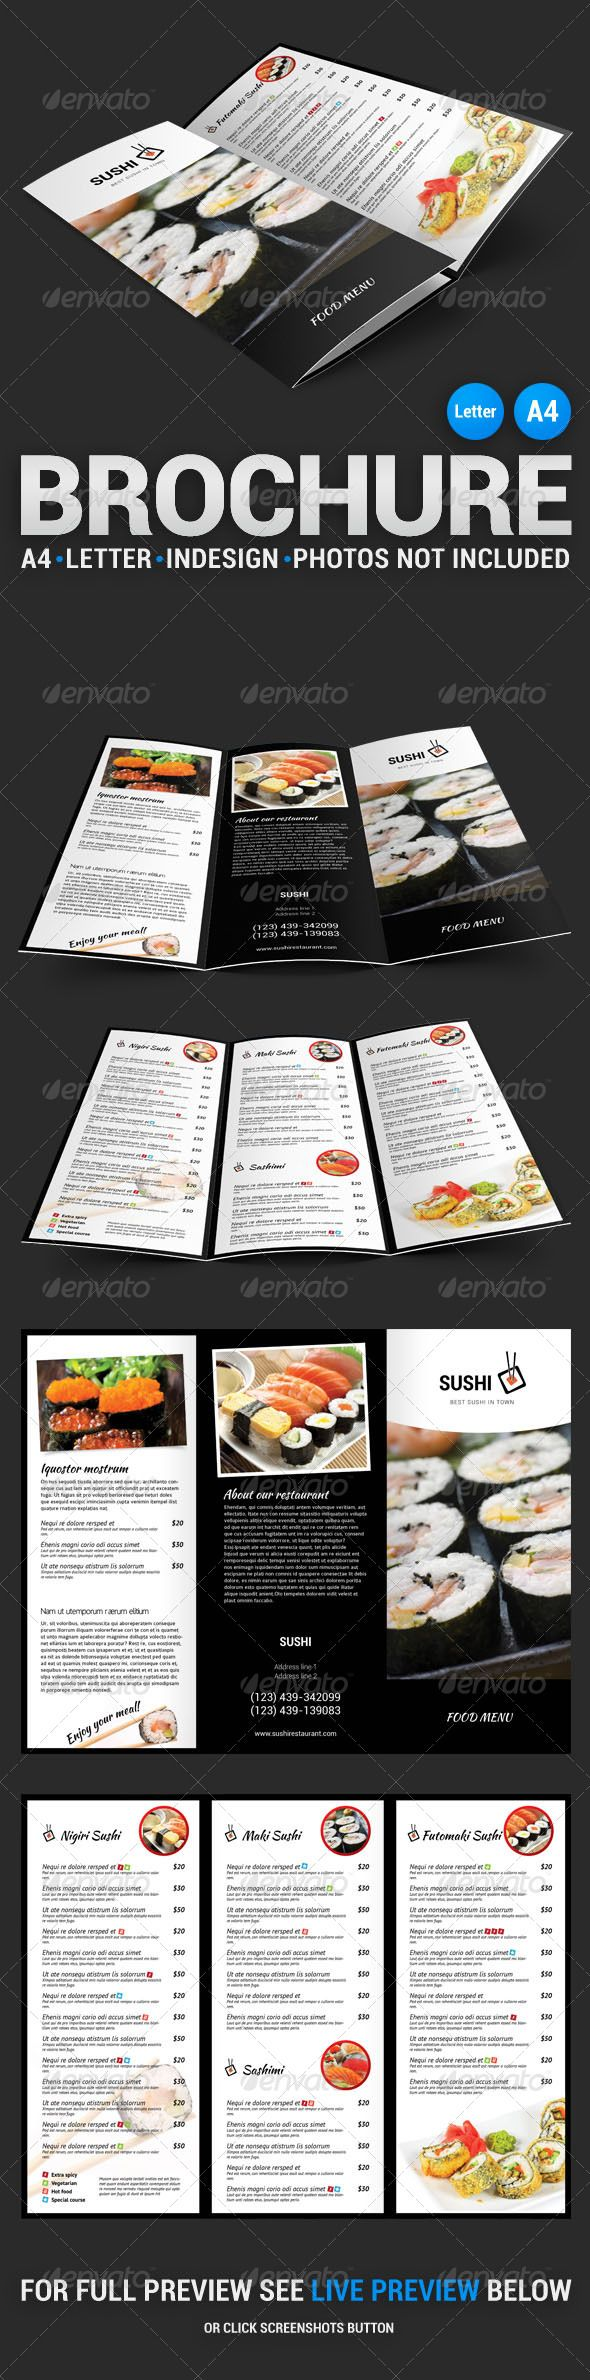 Sushi Menu Tri-Fold Brochure #template #layout